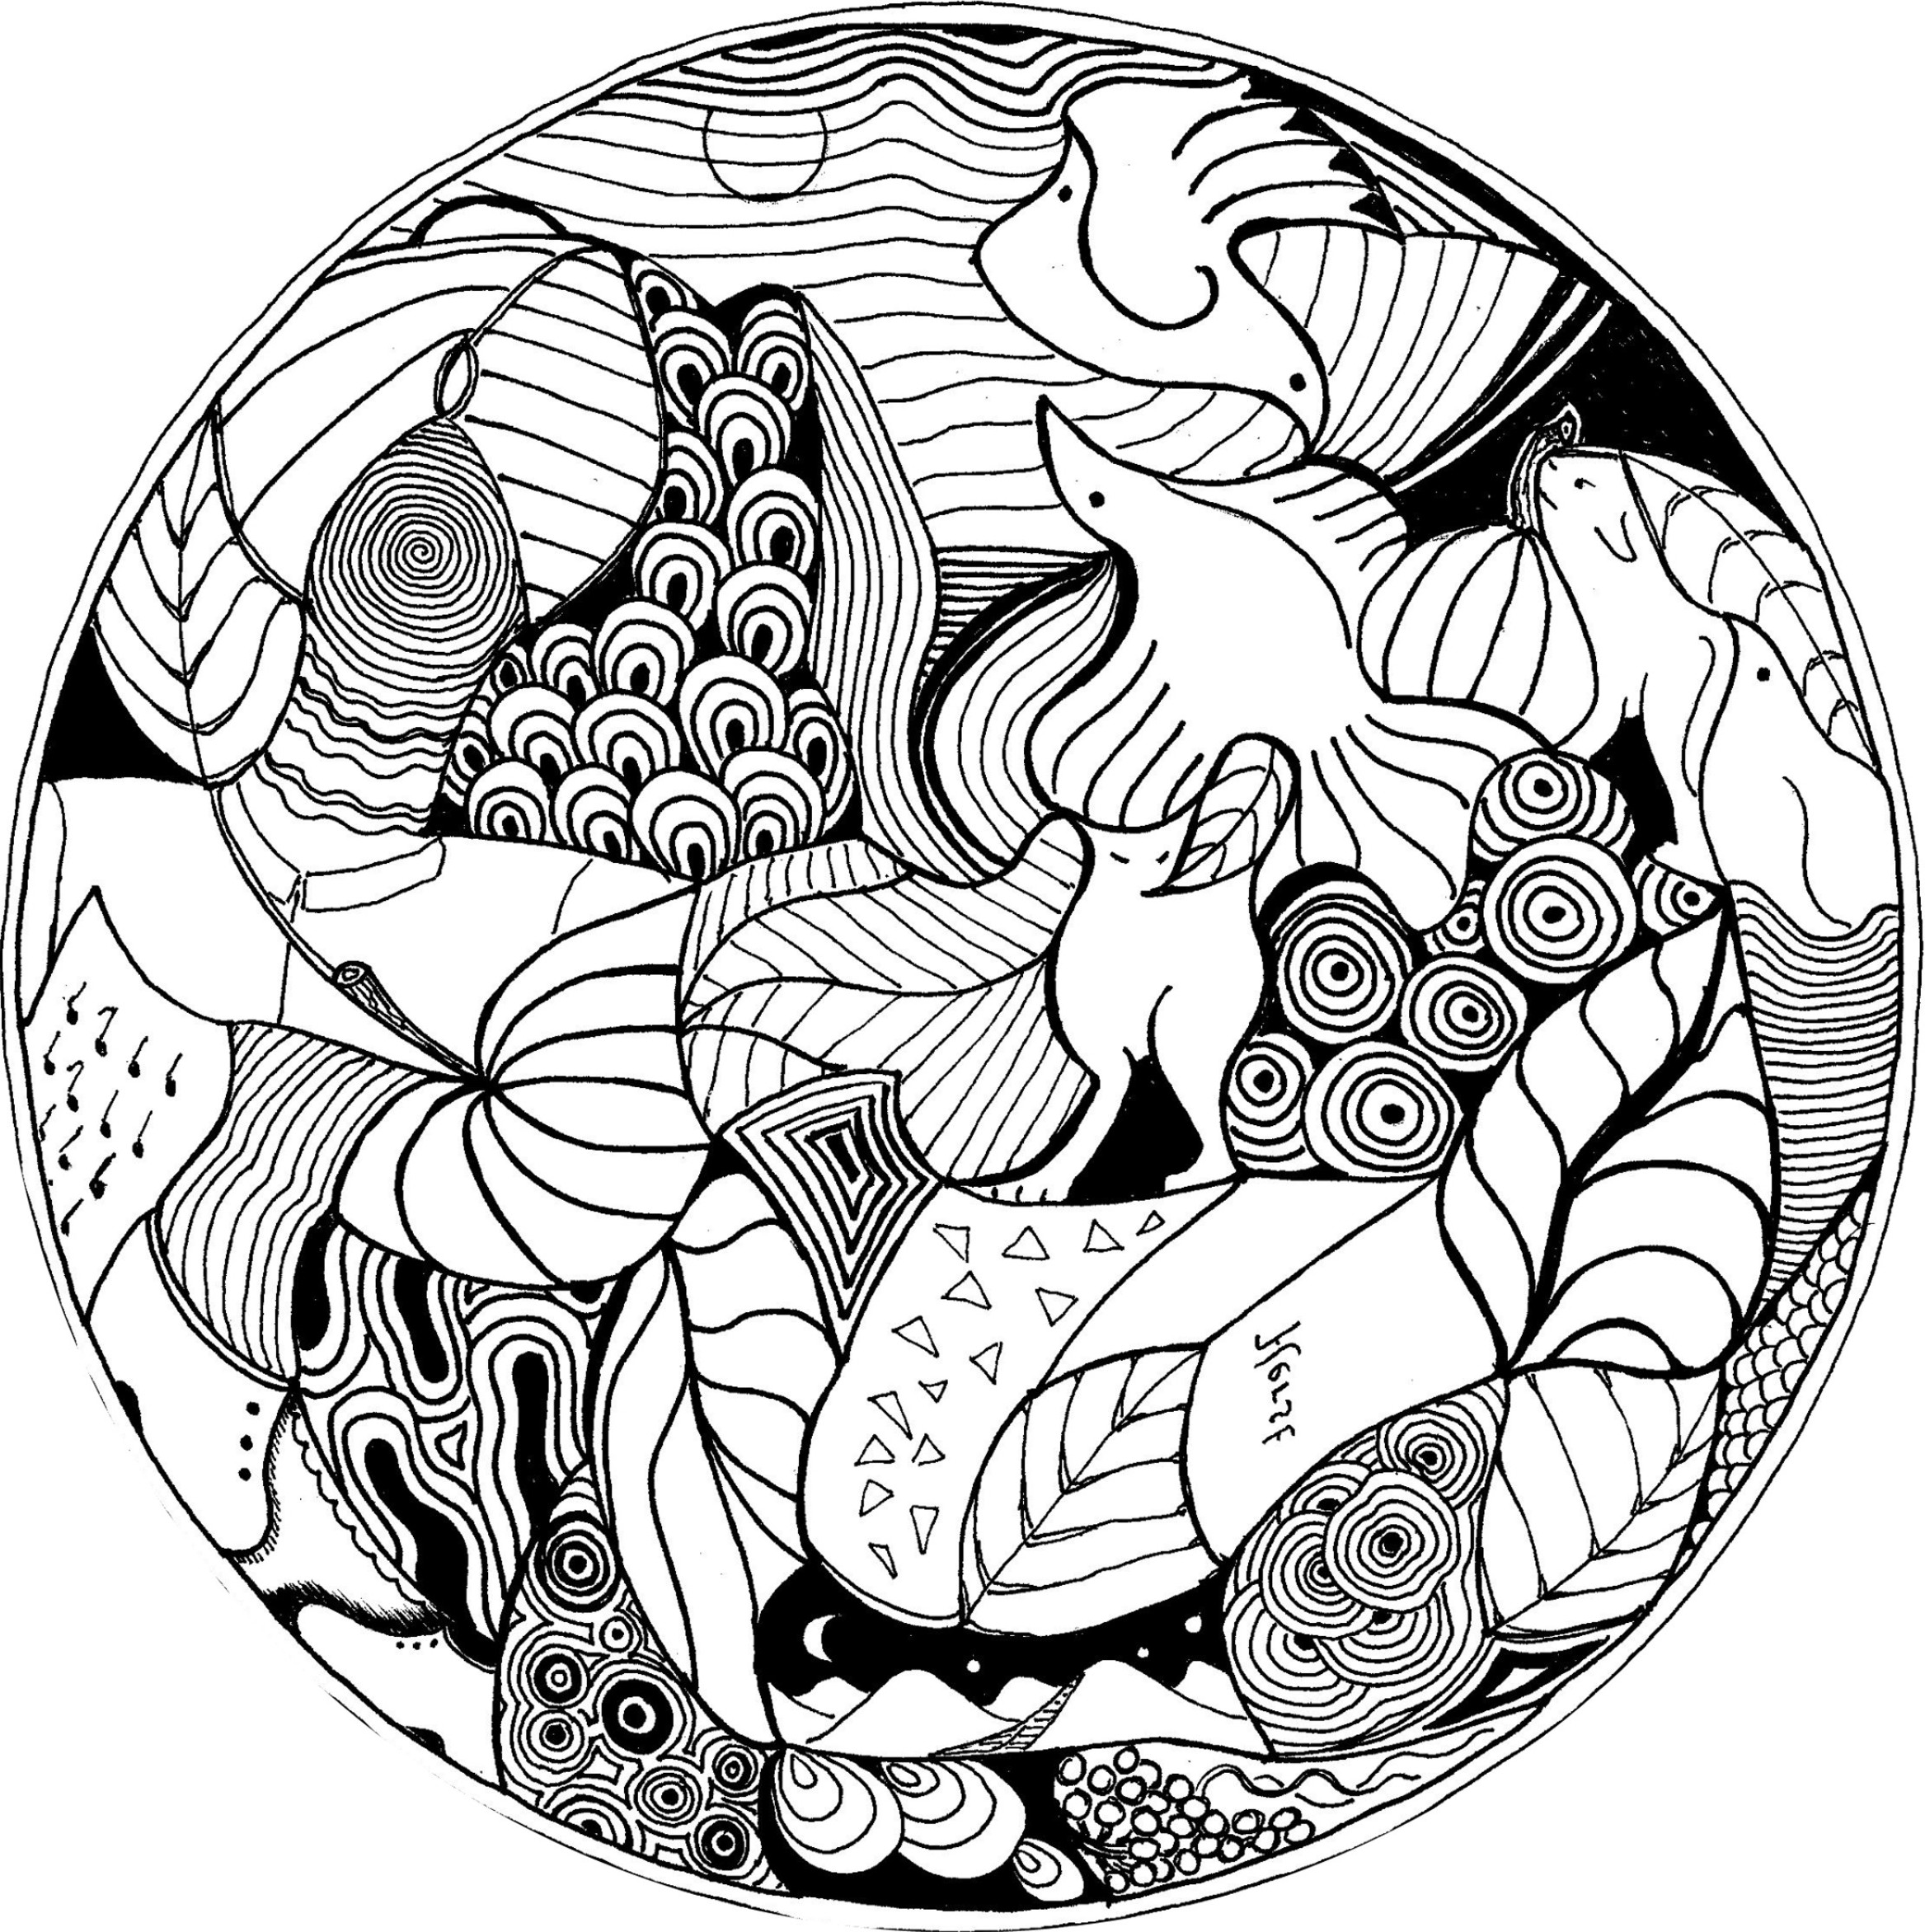 15 Coloriage Mandala attrape Reve